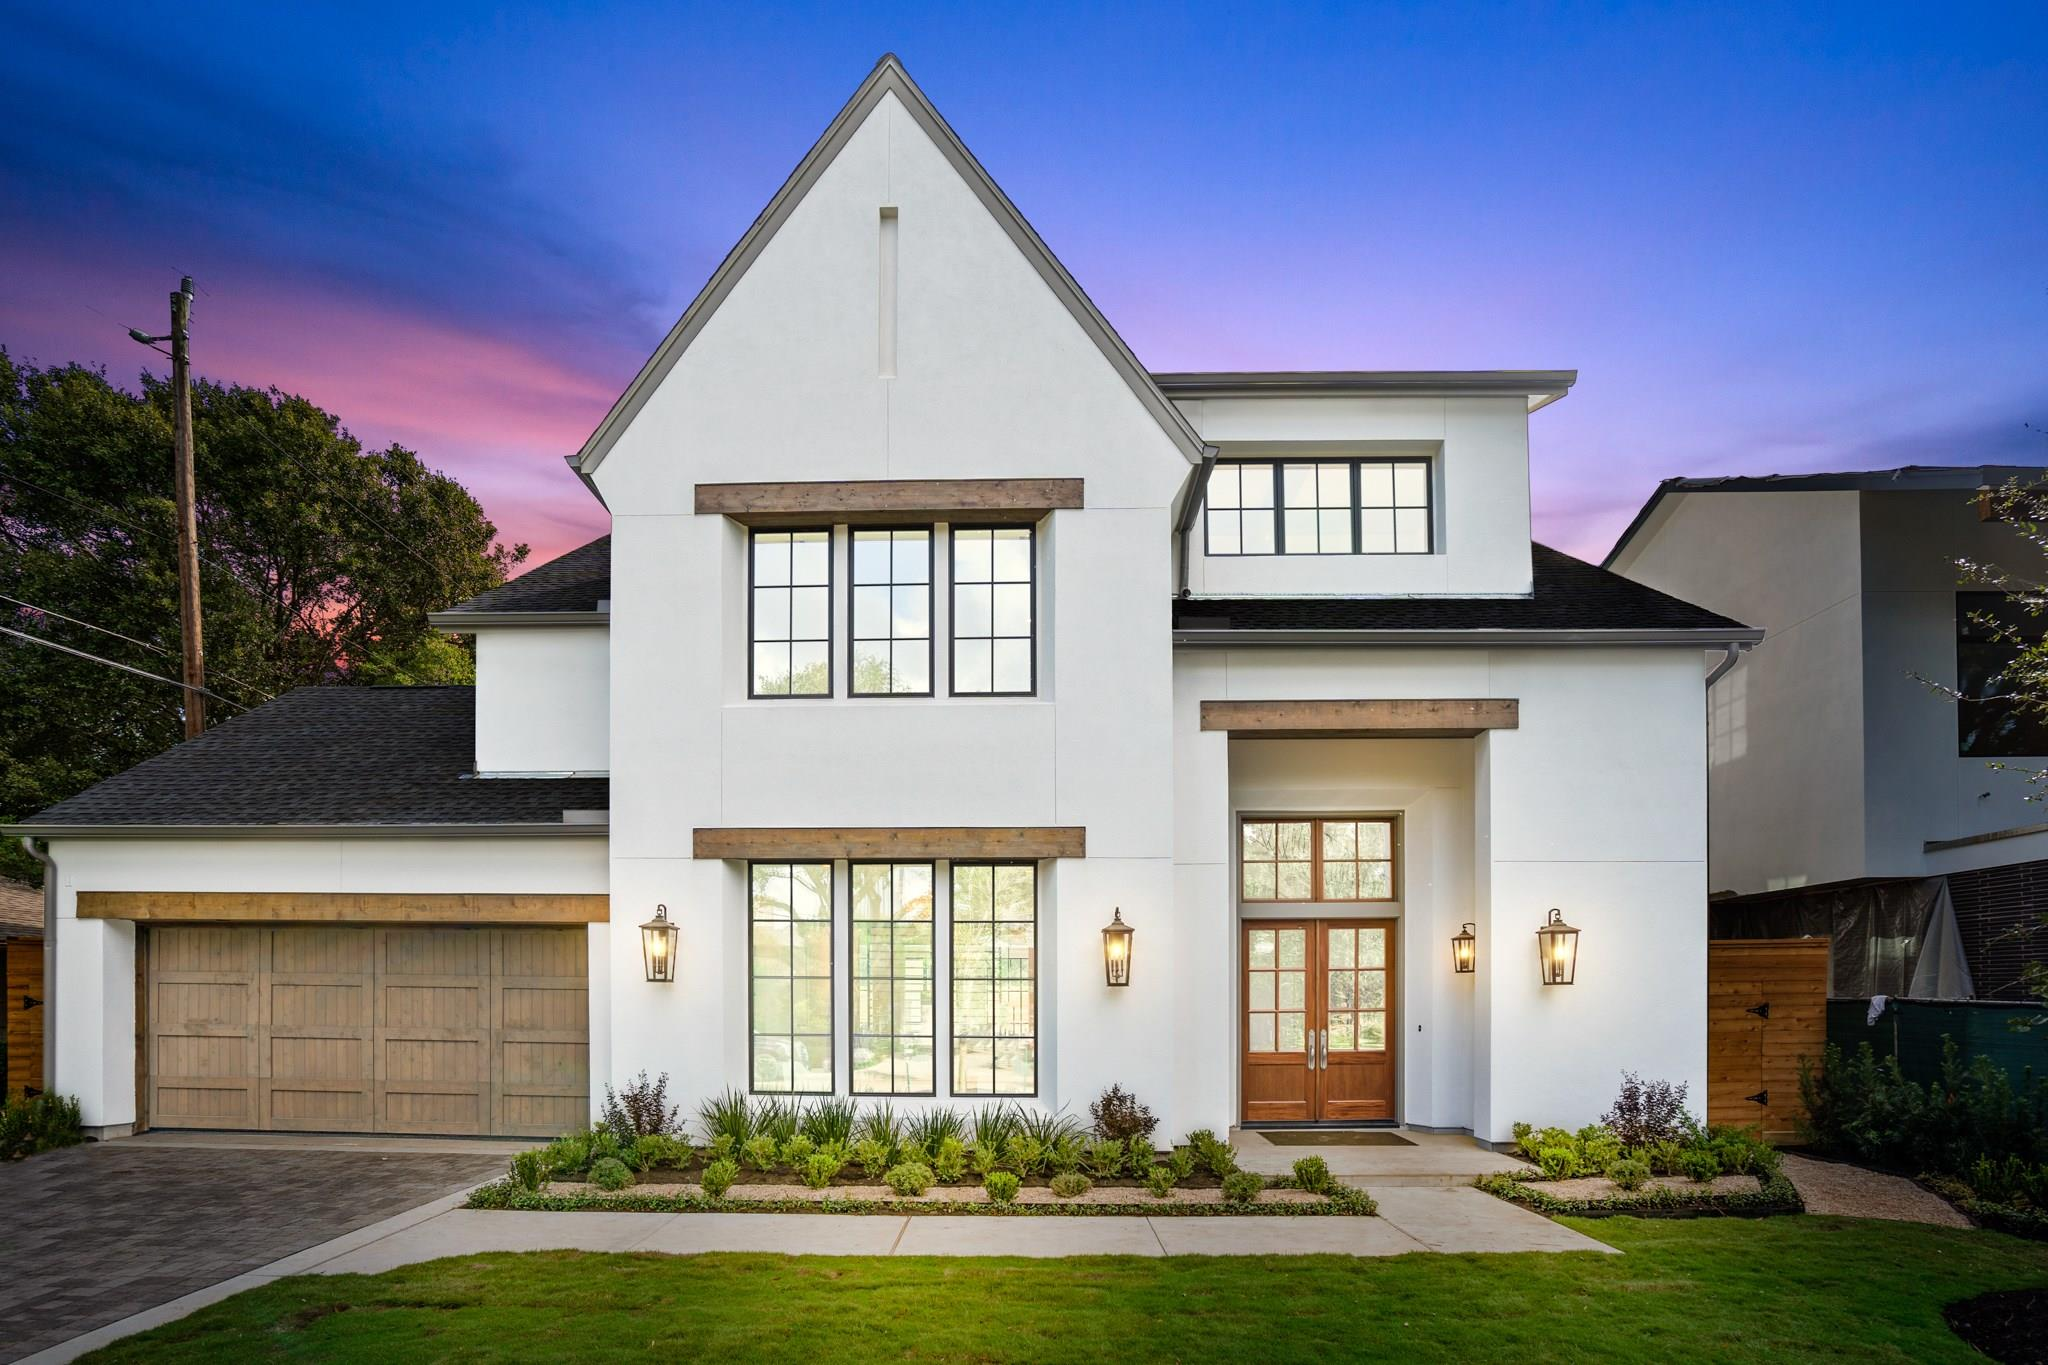 3211 Banbury Place Property Photo - Houston, TX real estate listing